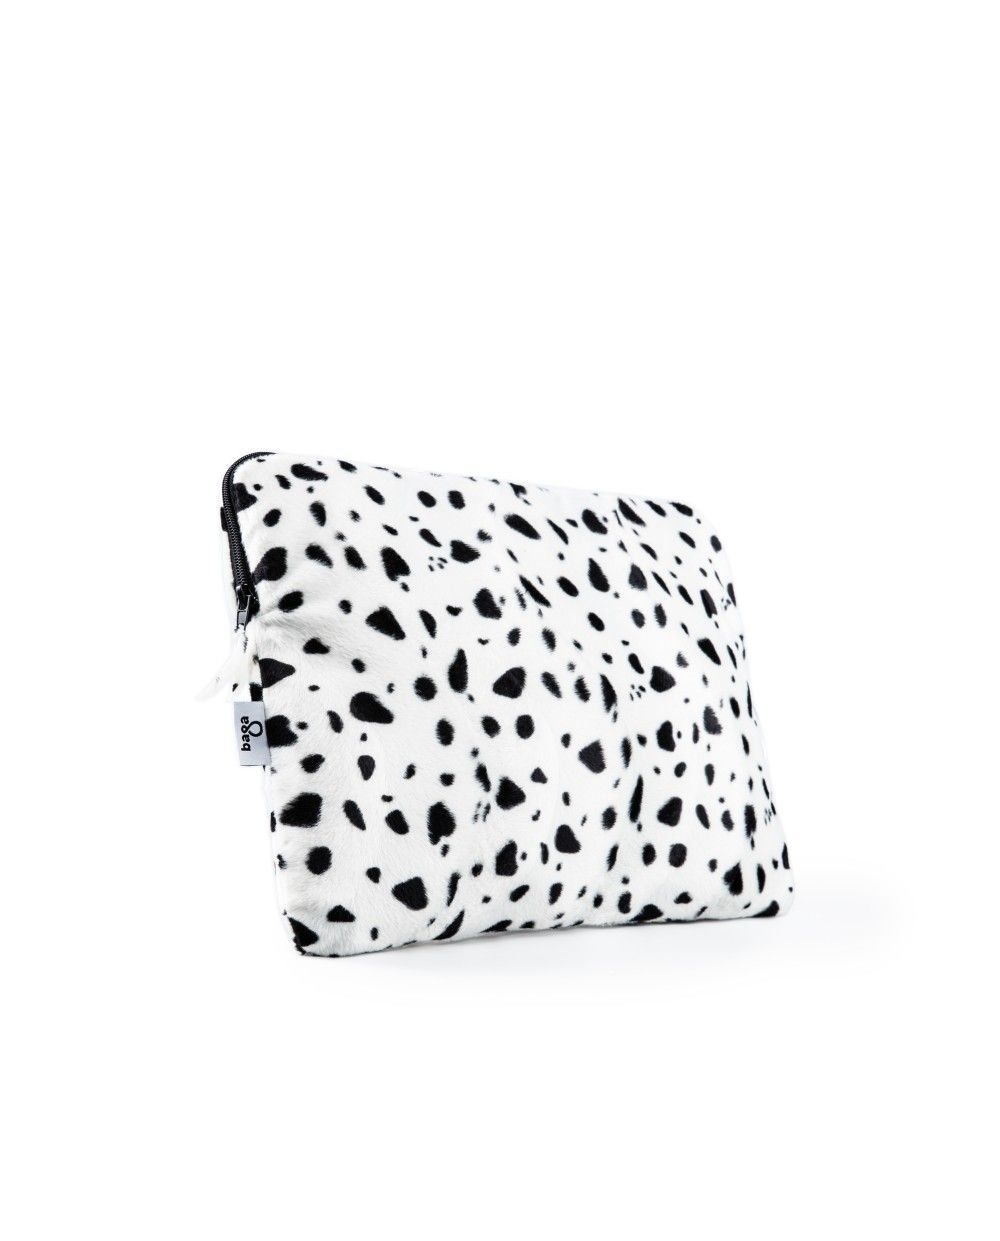 Http Www Krakowiankasklep Pl Pokrowiec Z Futerka Id 2057 Html Laptop Bag Fashion Unique Items Products Laptop Bag